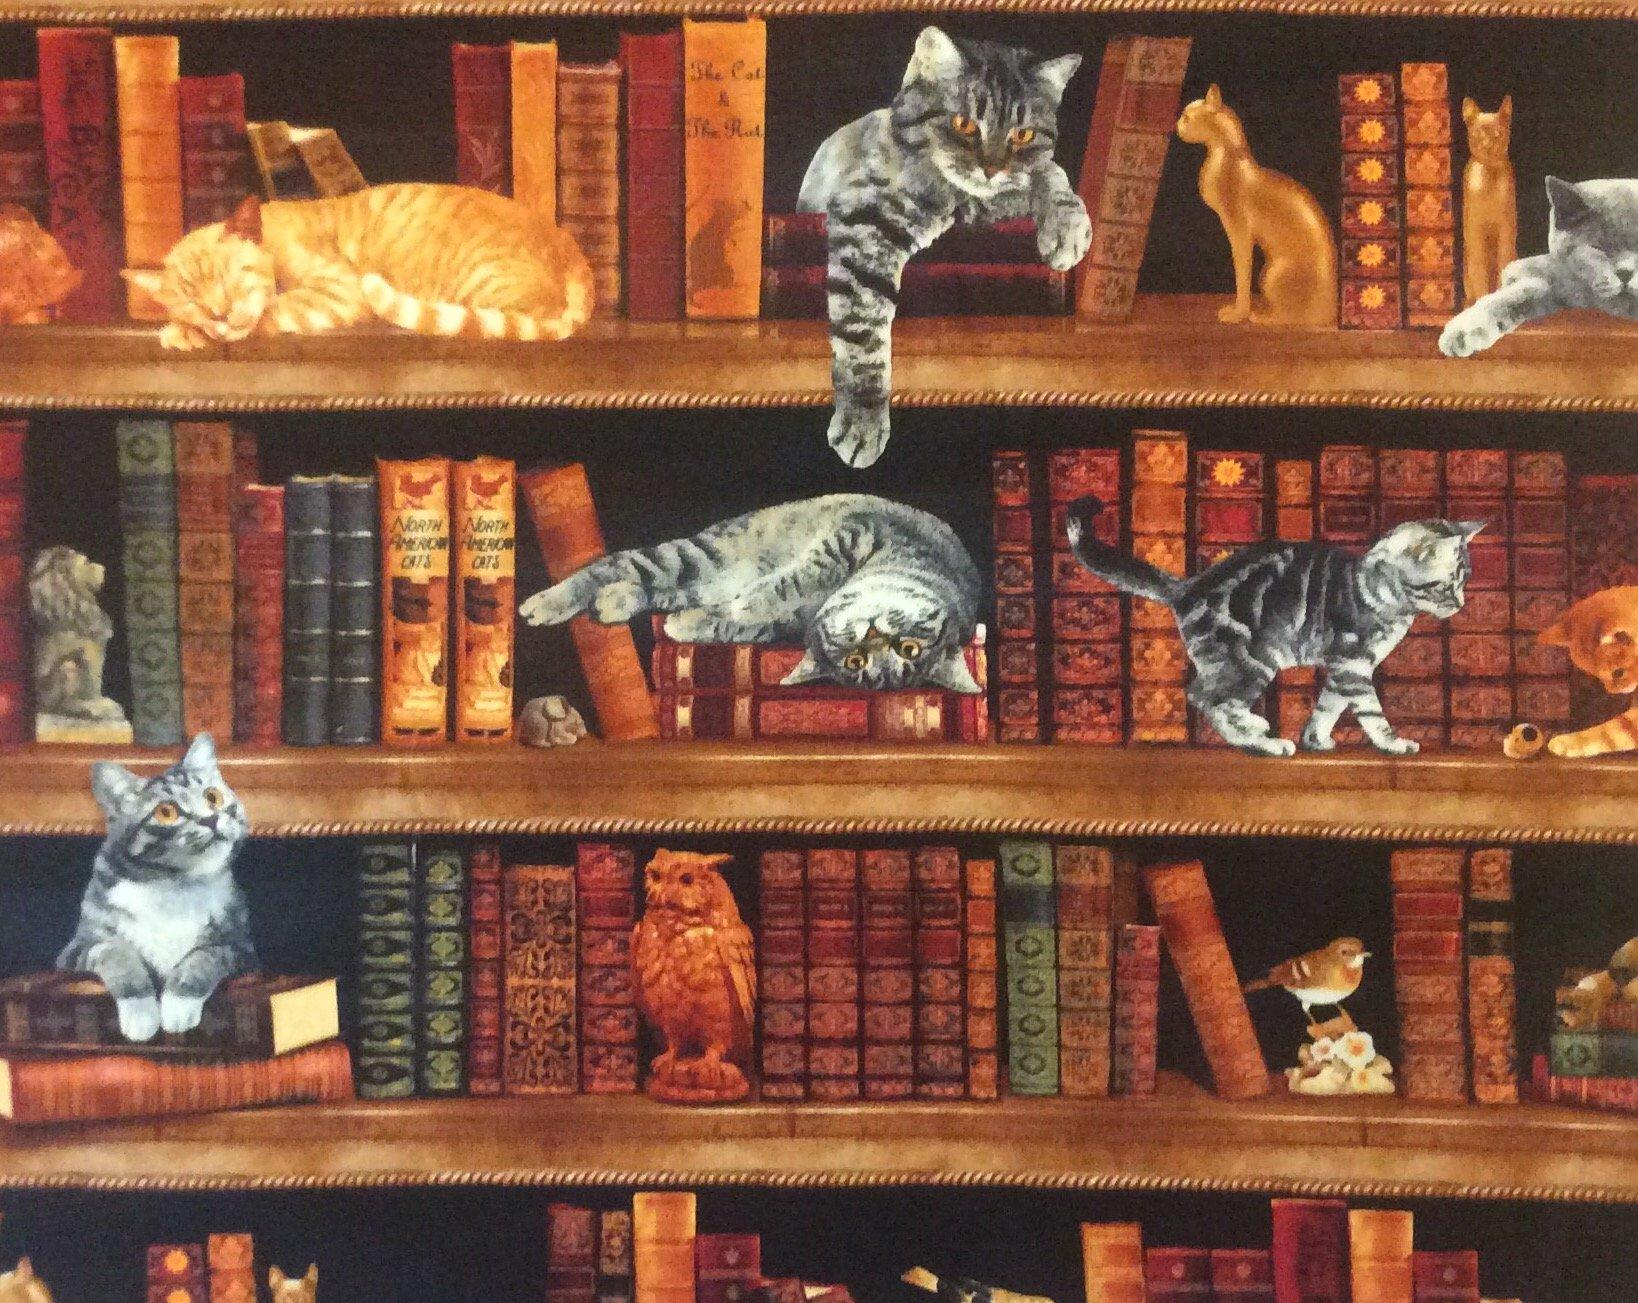 NT09 Library Kitty Cat Books Literature Kitten Cotton Quilt Fabric